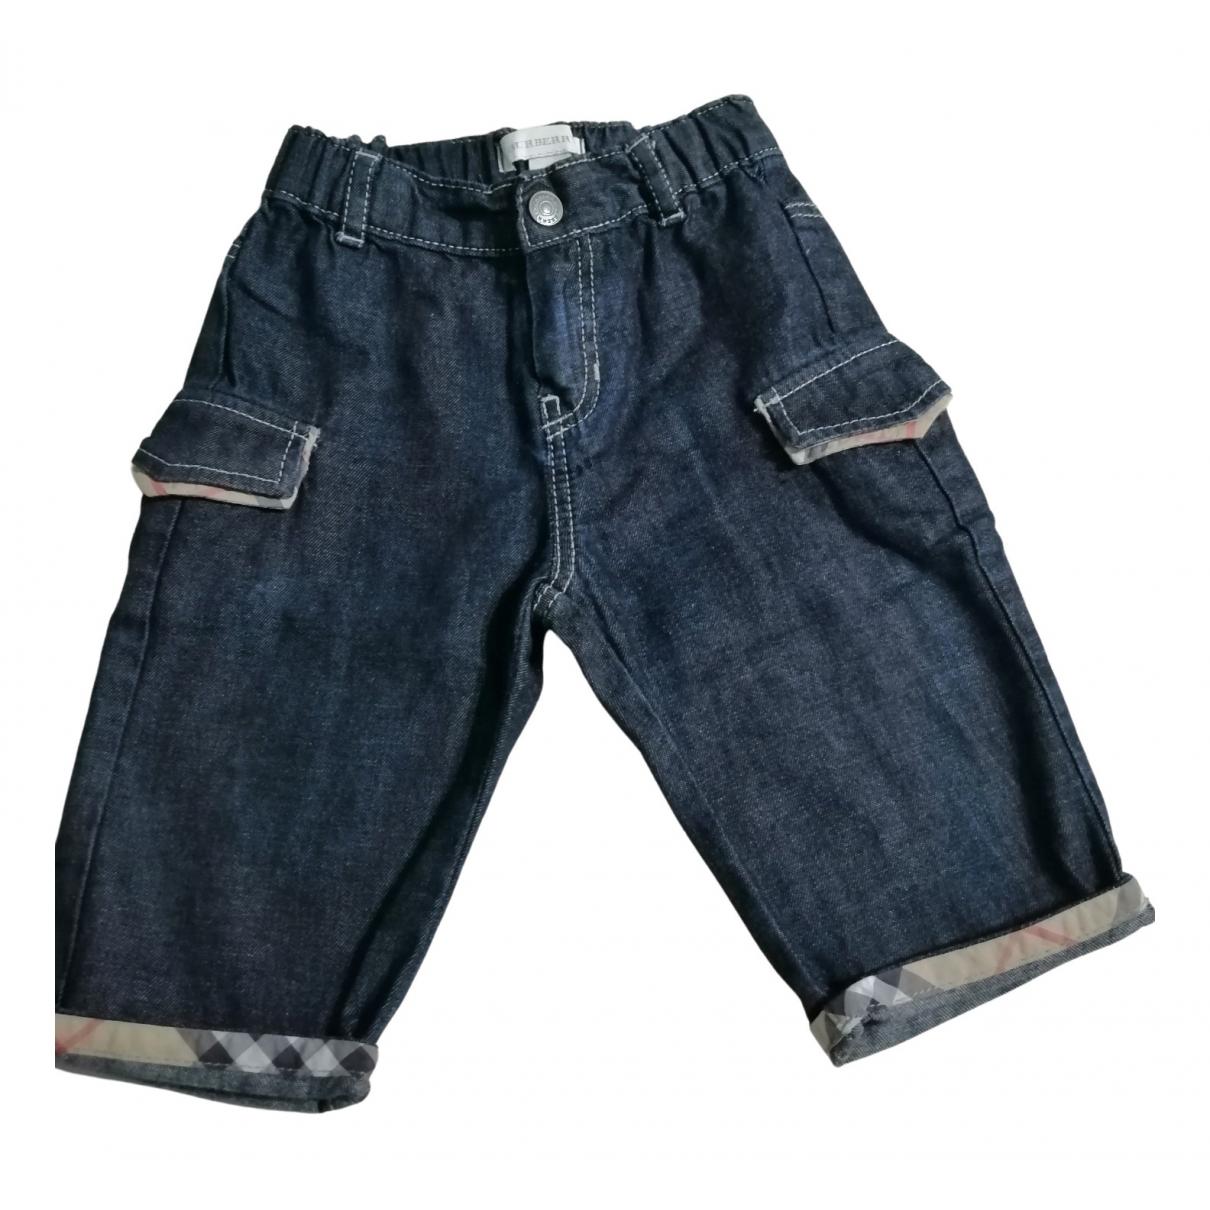 Burberry - Pantalon   pour enfant en denim - bleu